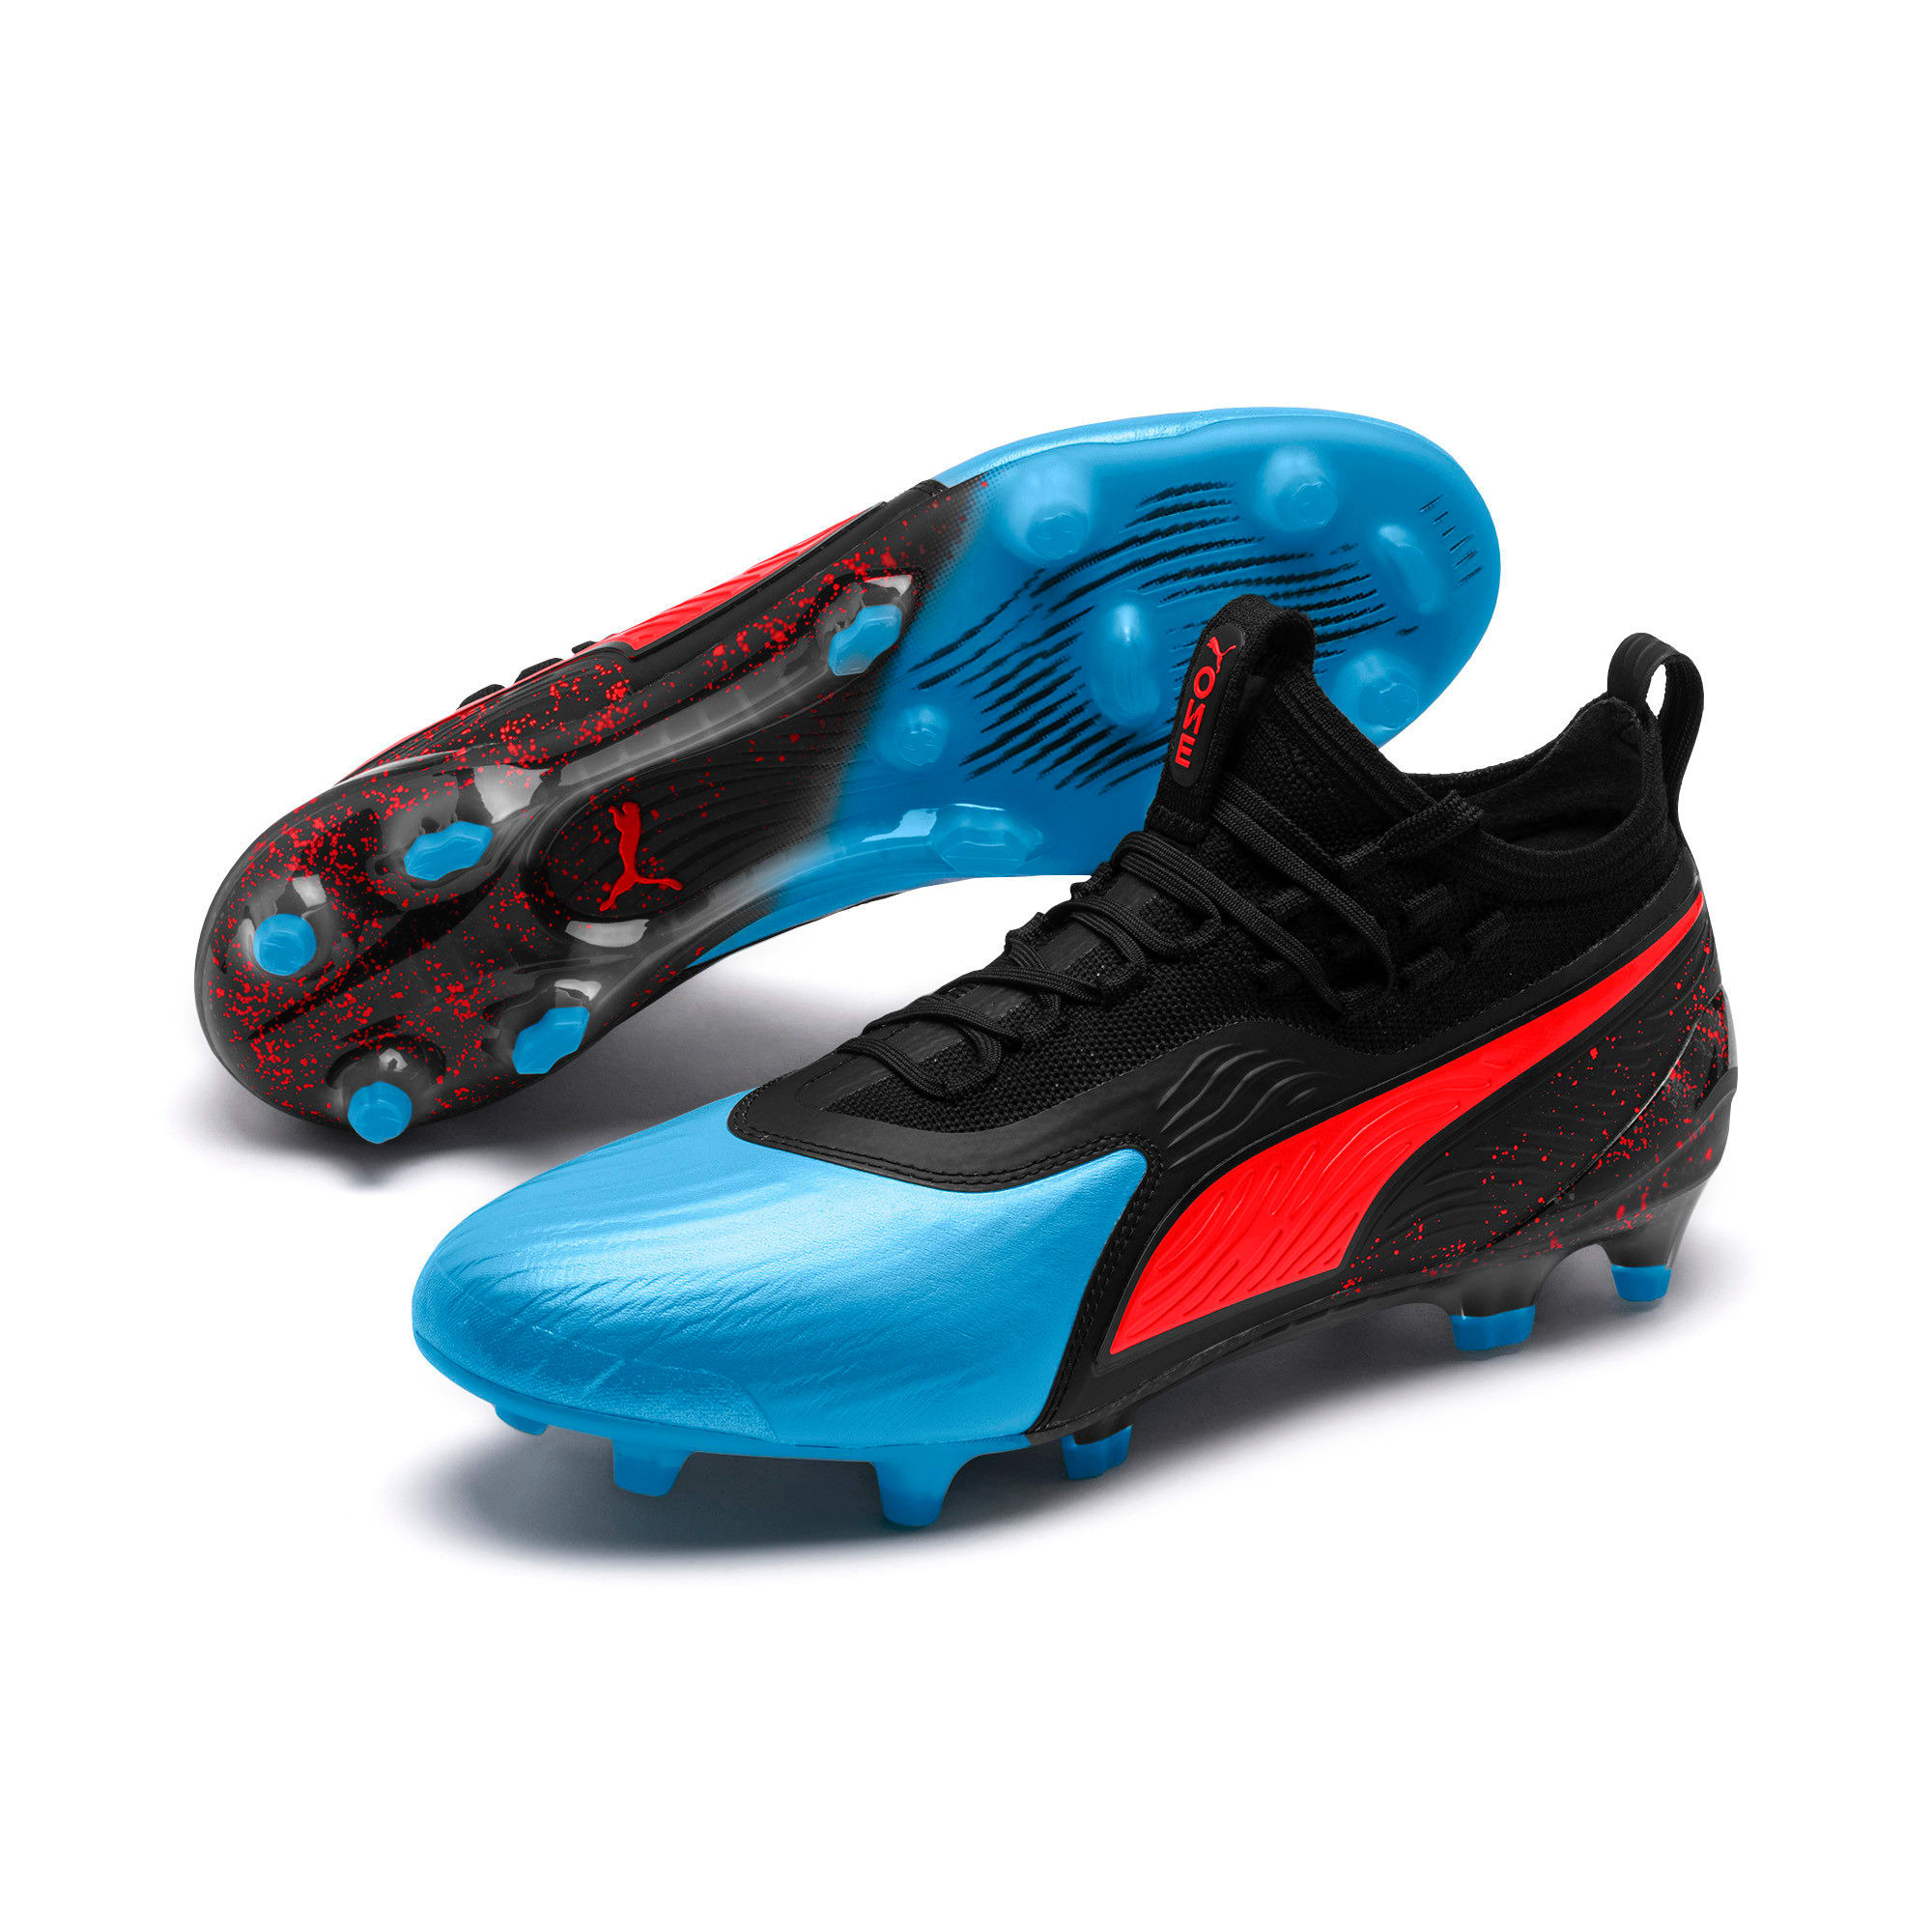 Thumbnail 3 of PUMA ONE 19.1 evoKNIT FG/AG Men's Football Boots, Bleu Azur-Red Blast-Black, medium-IND